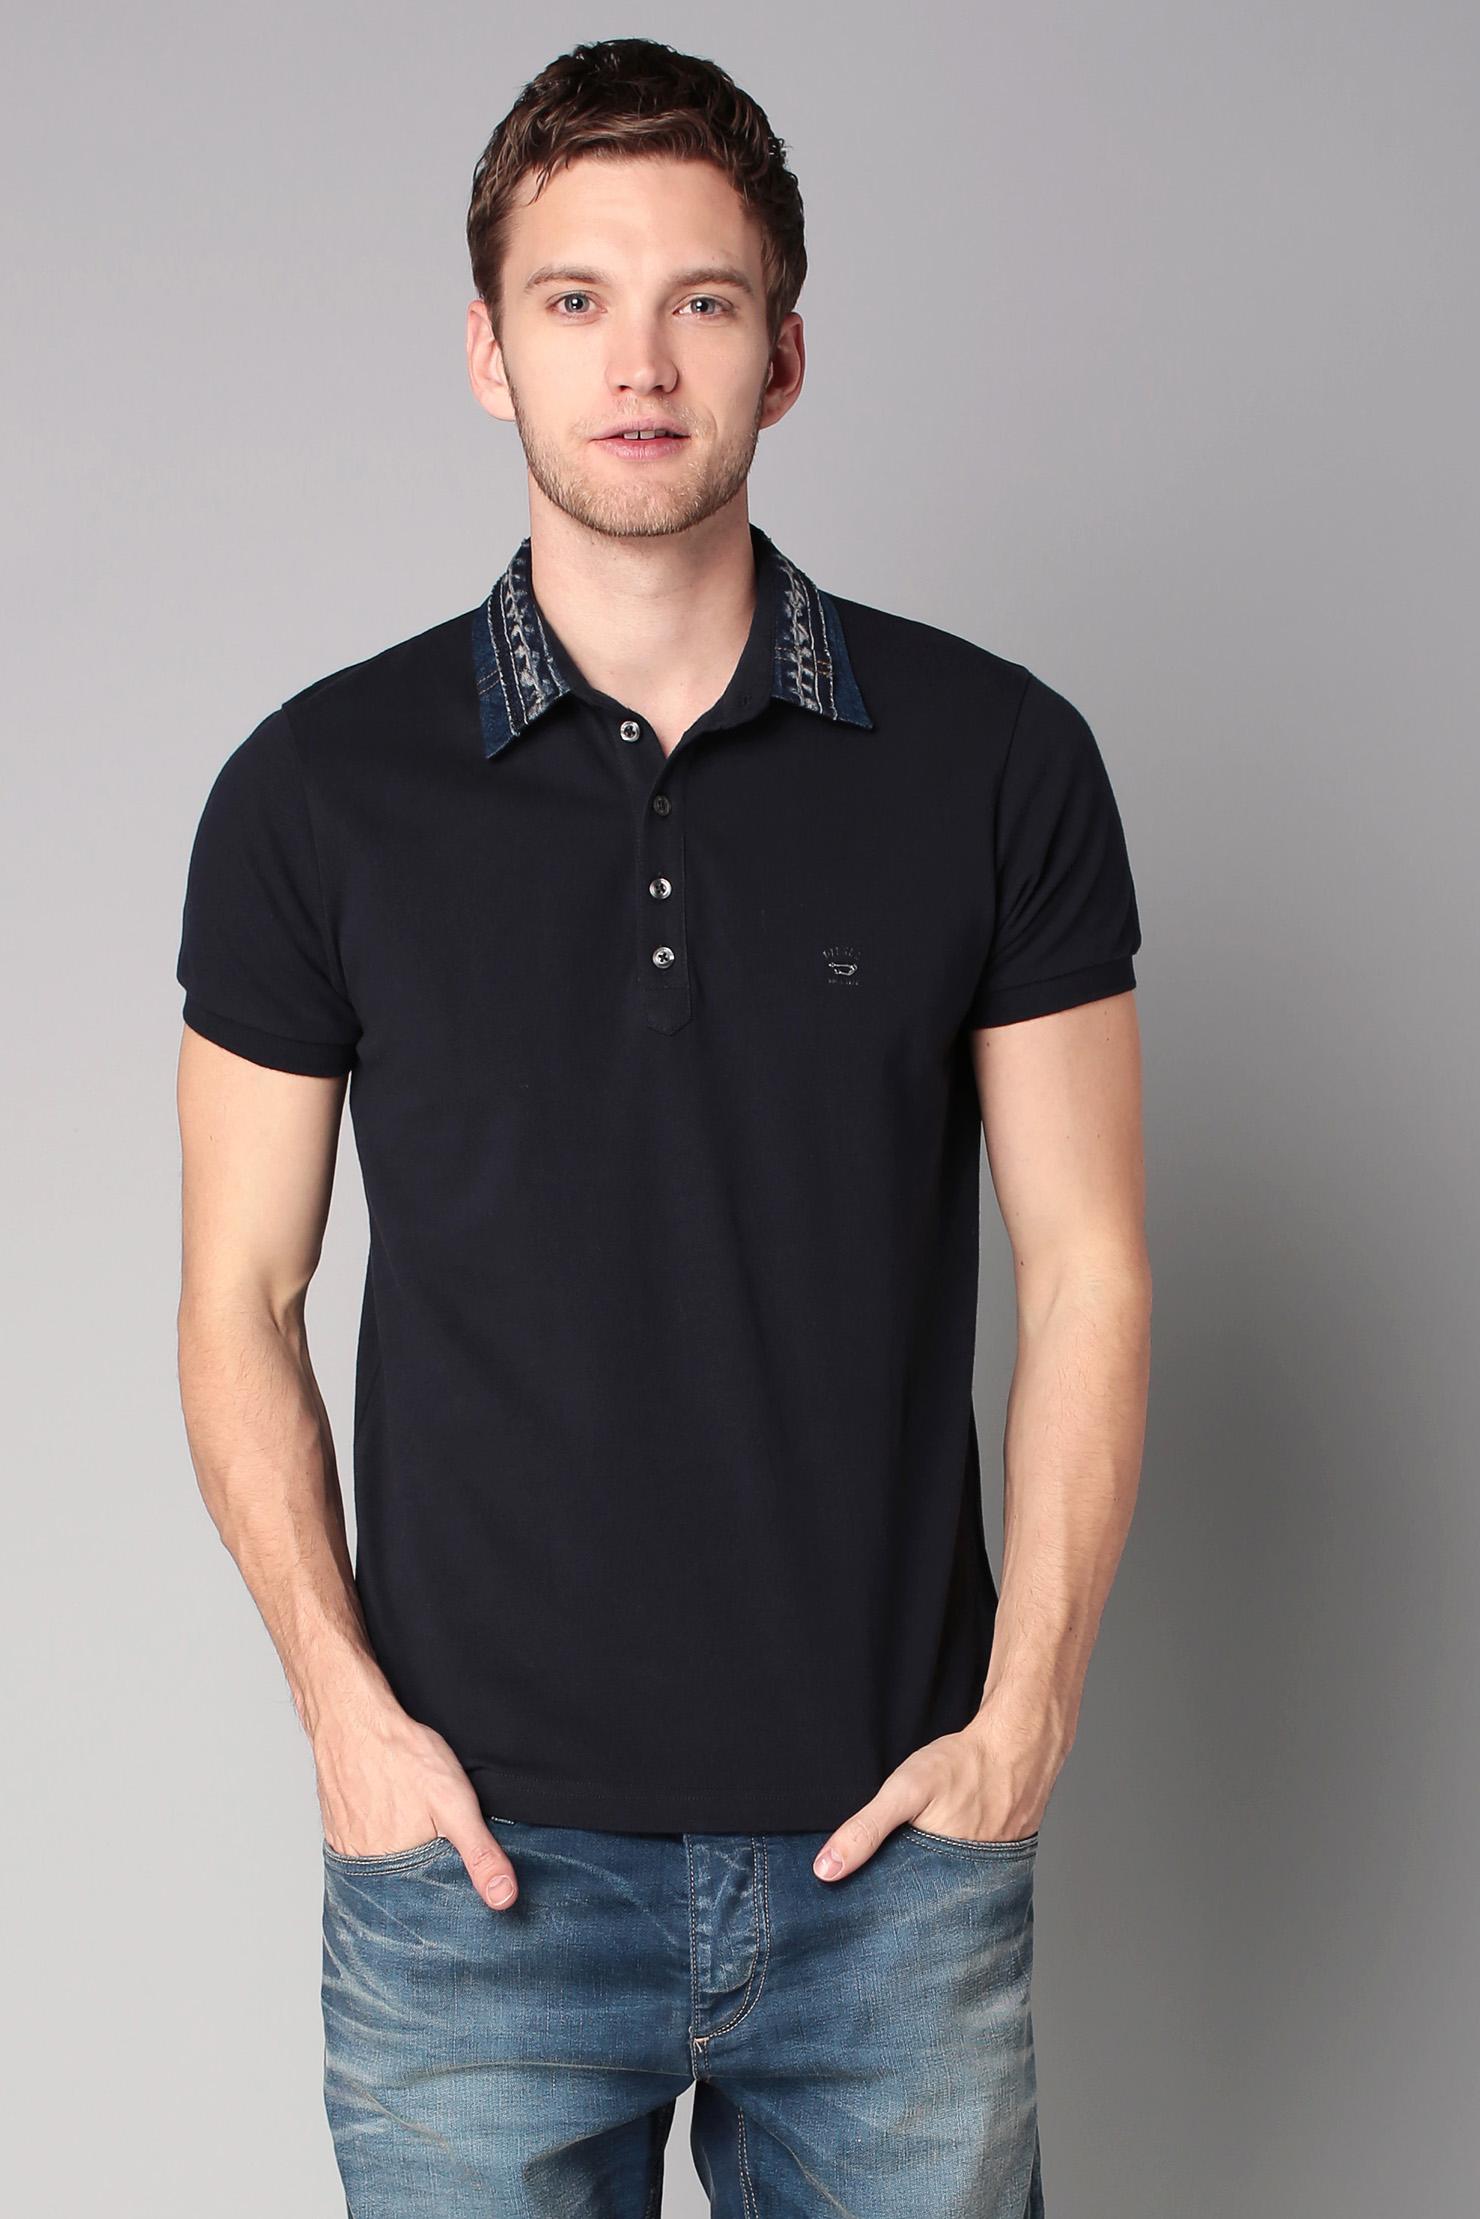 lyst diesel polo shirt in blue for men. Black Bedroom Furniture Sets. Home Design Ideas